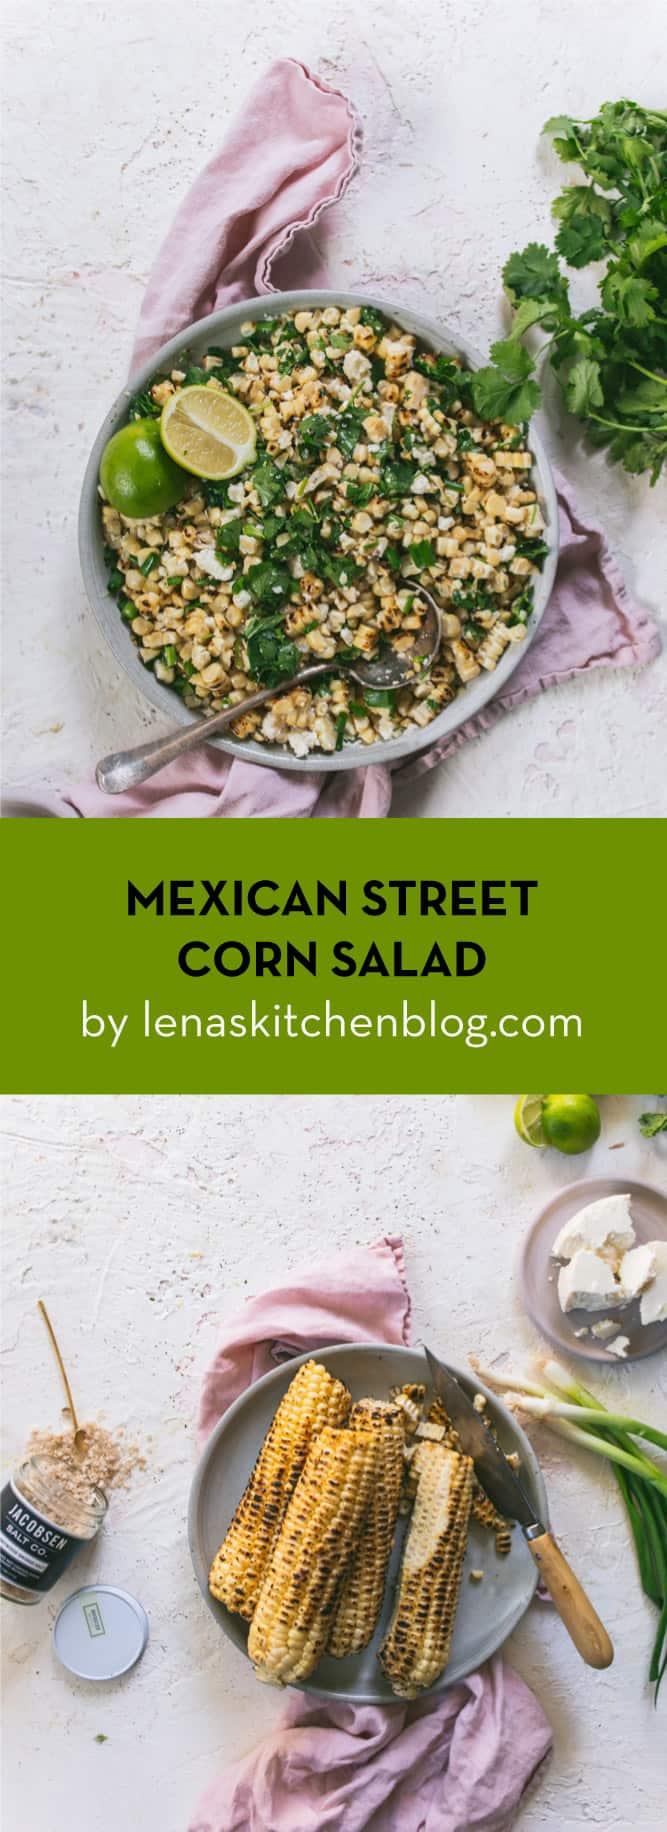 LENASKITCHEN MEXICAN STREET CORN SALAD